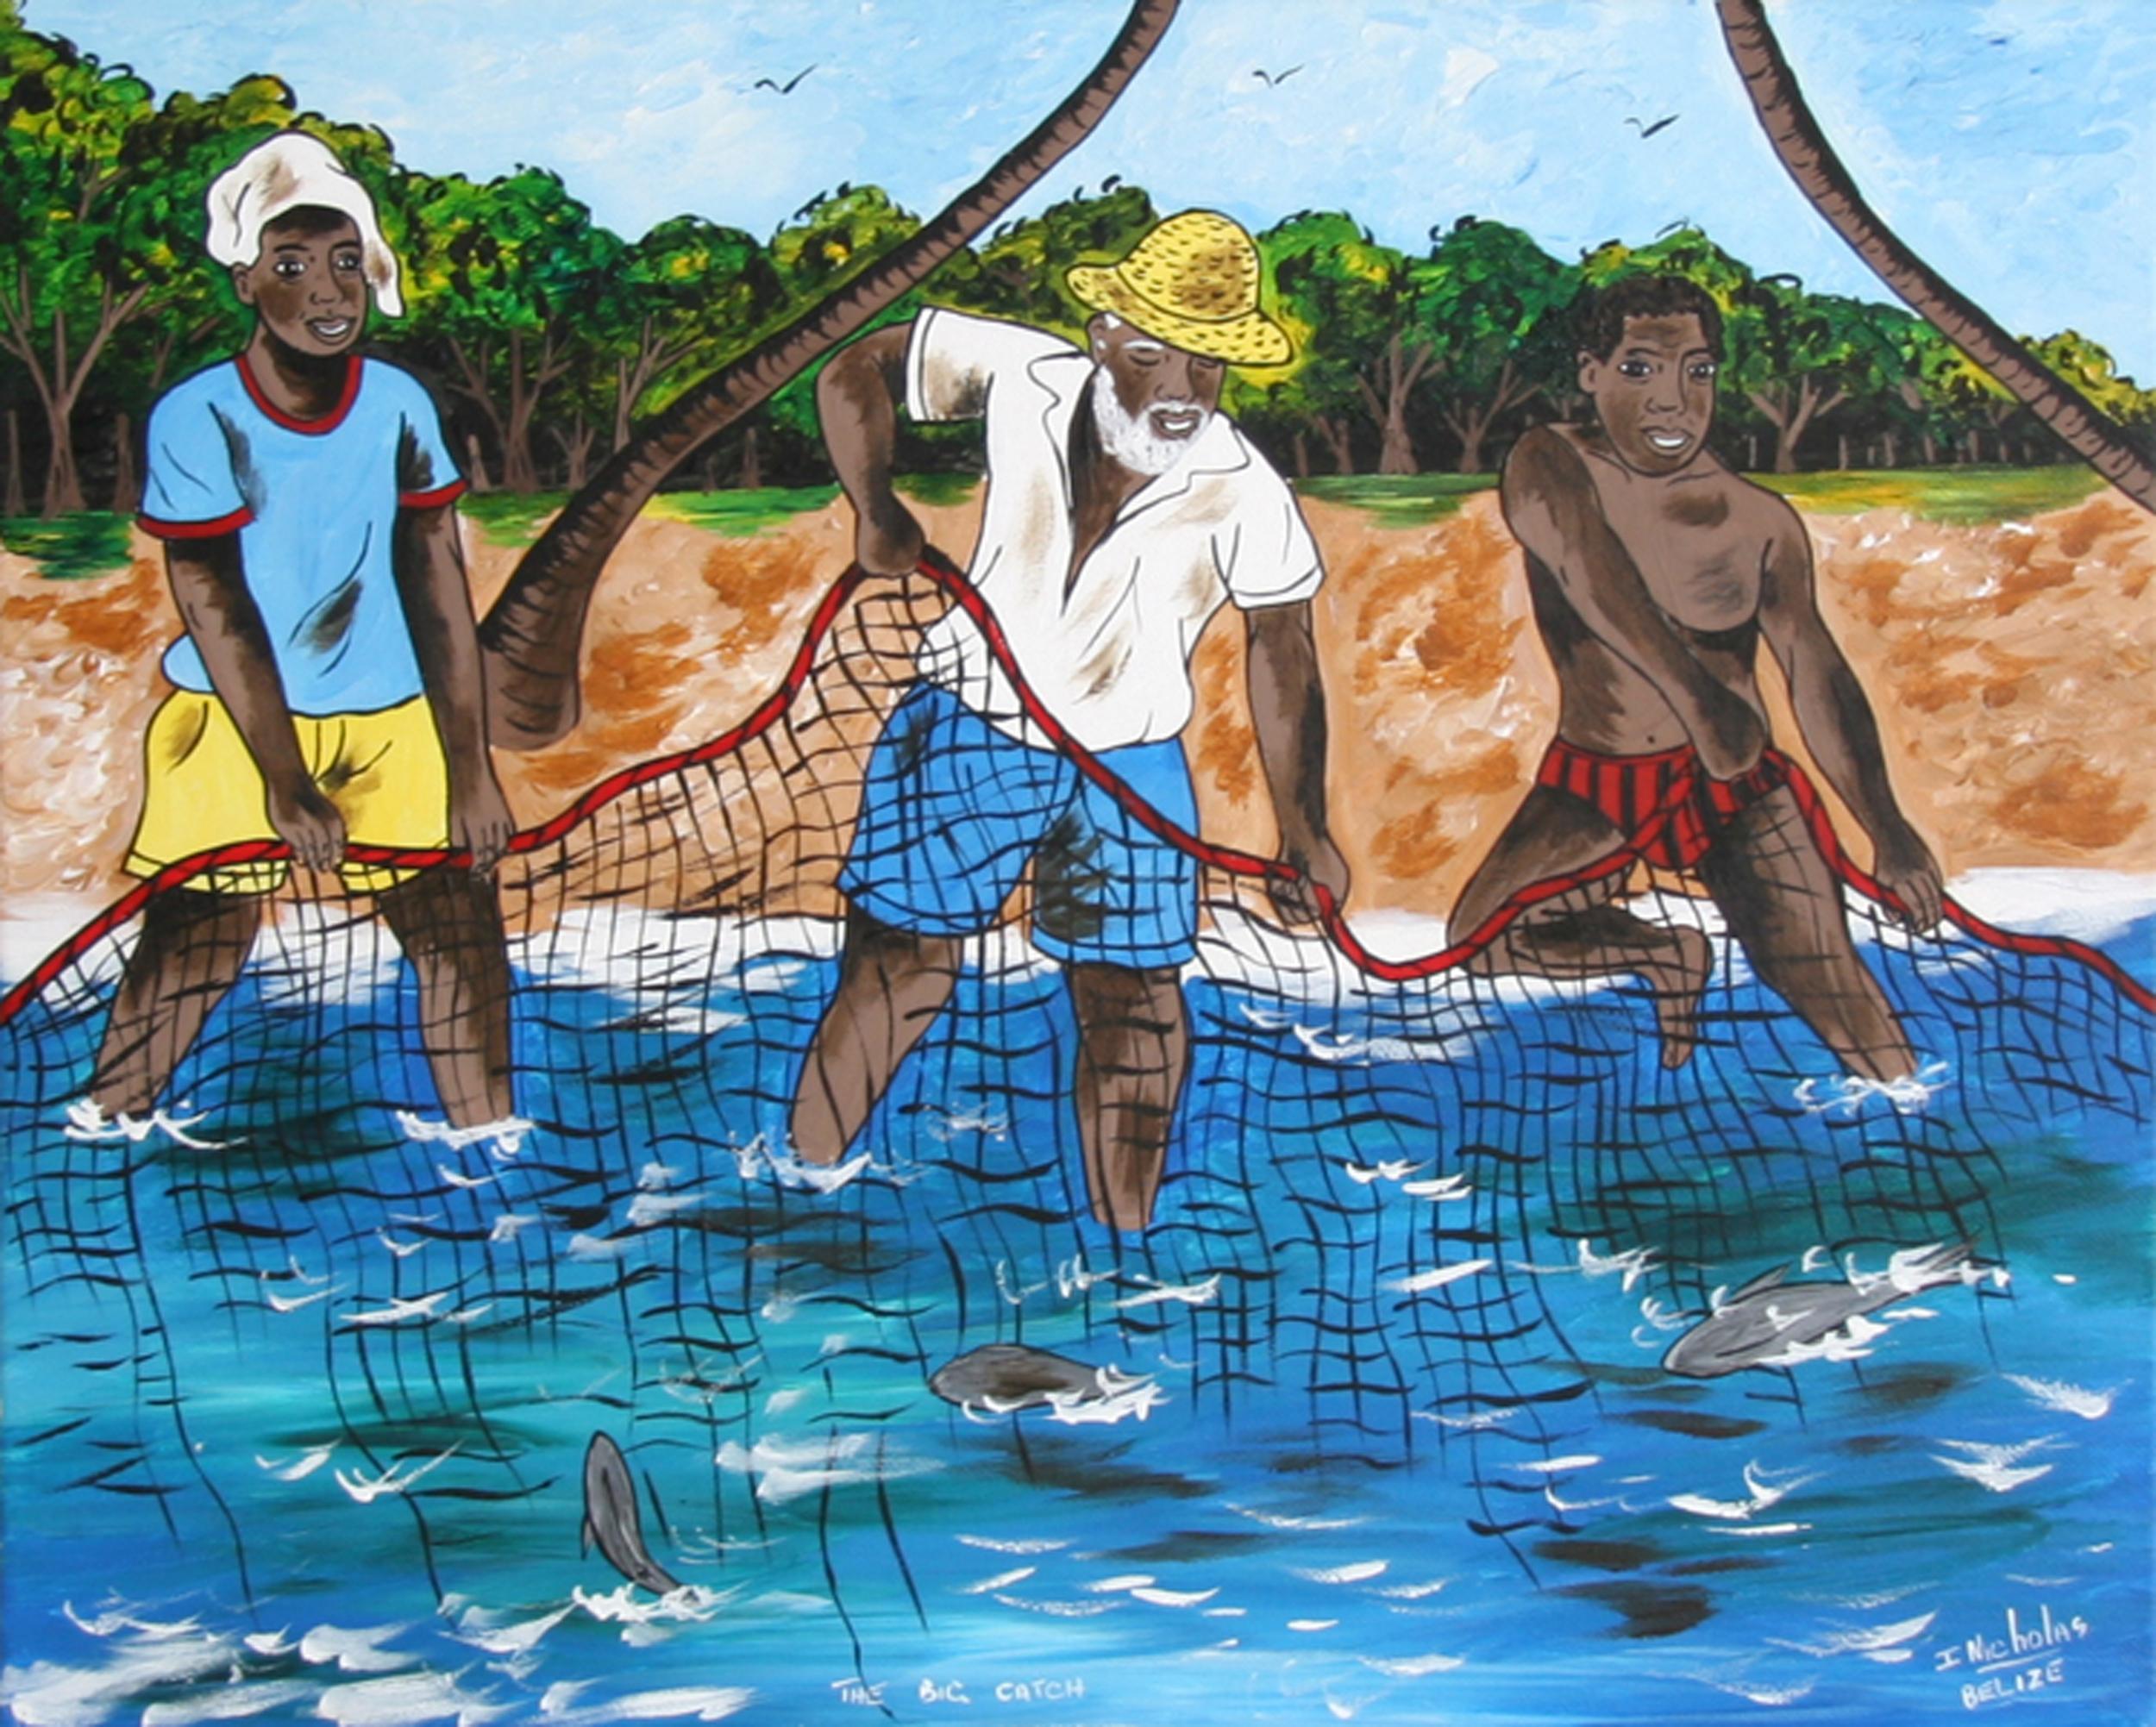 Isiah Nicholas, The Big Catch, Acrylic Painting